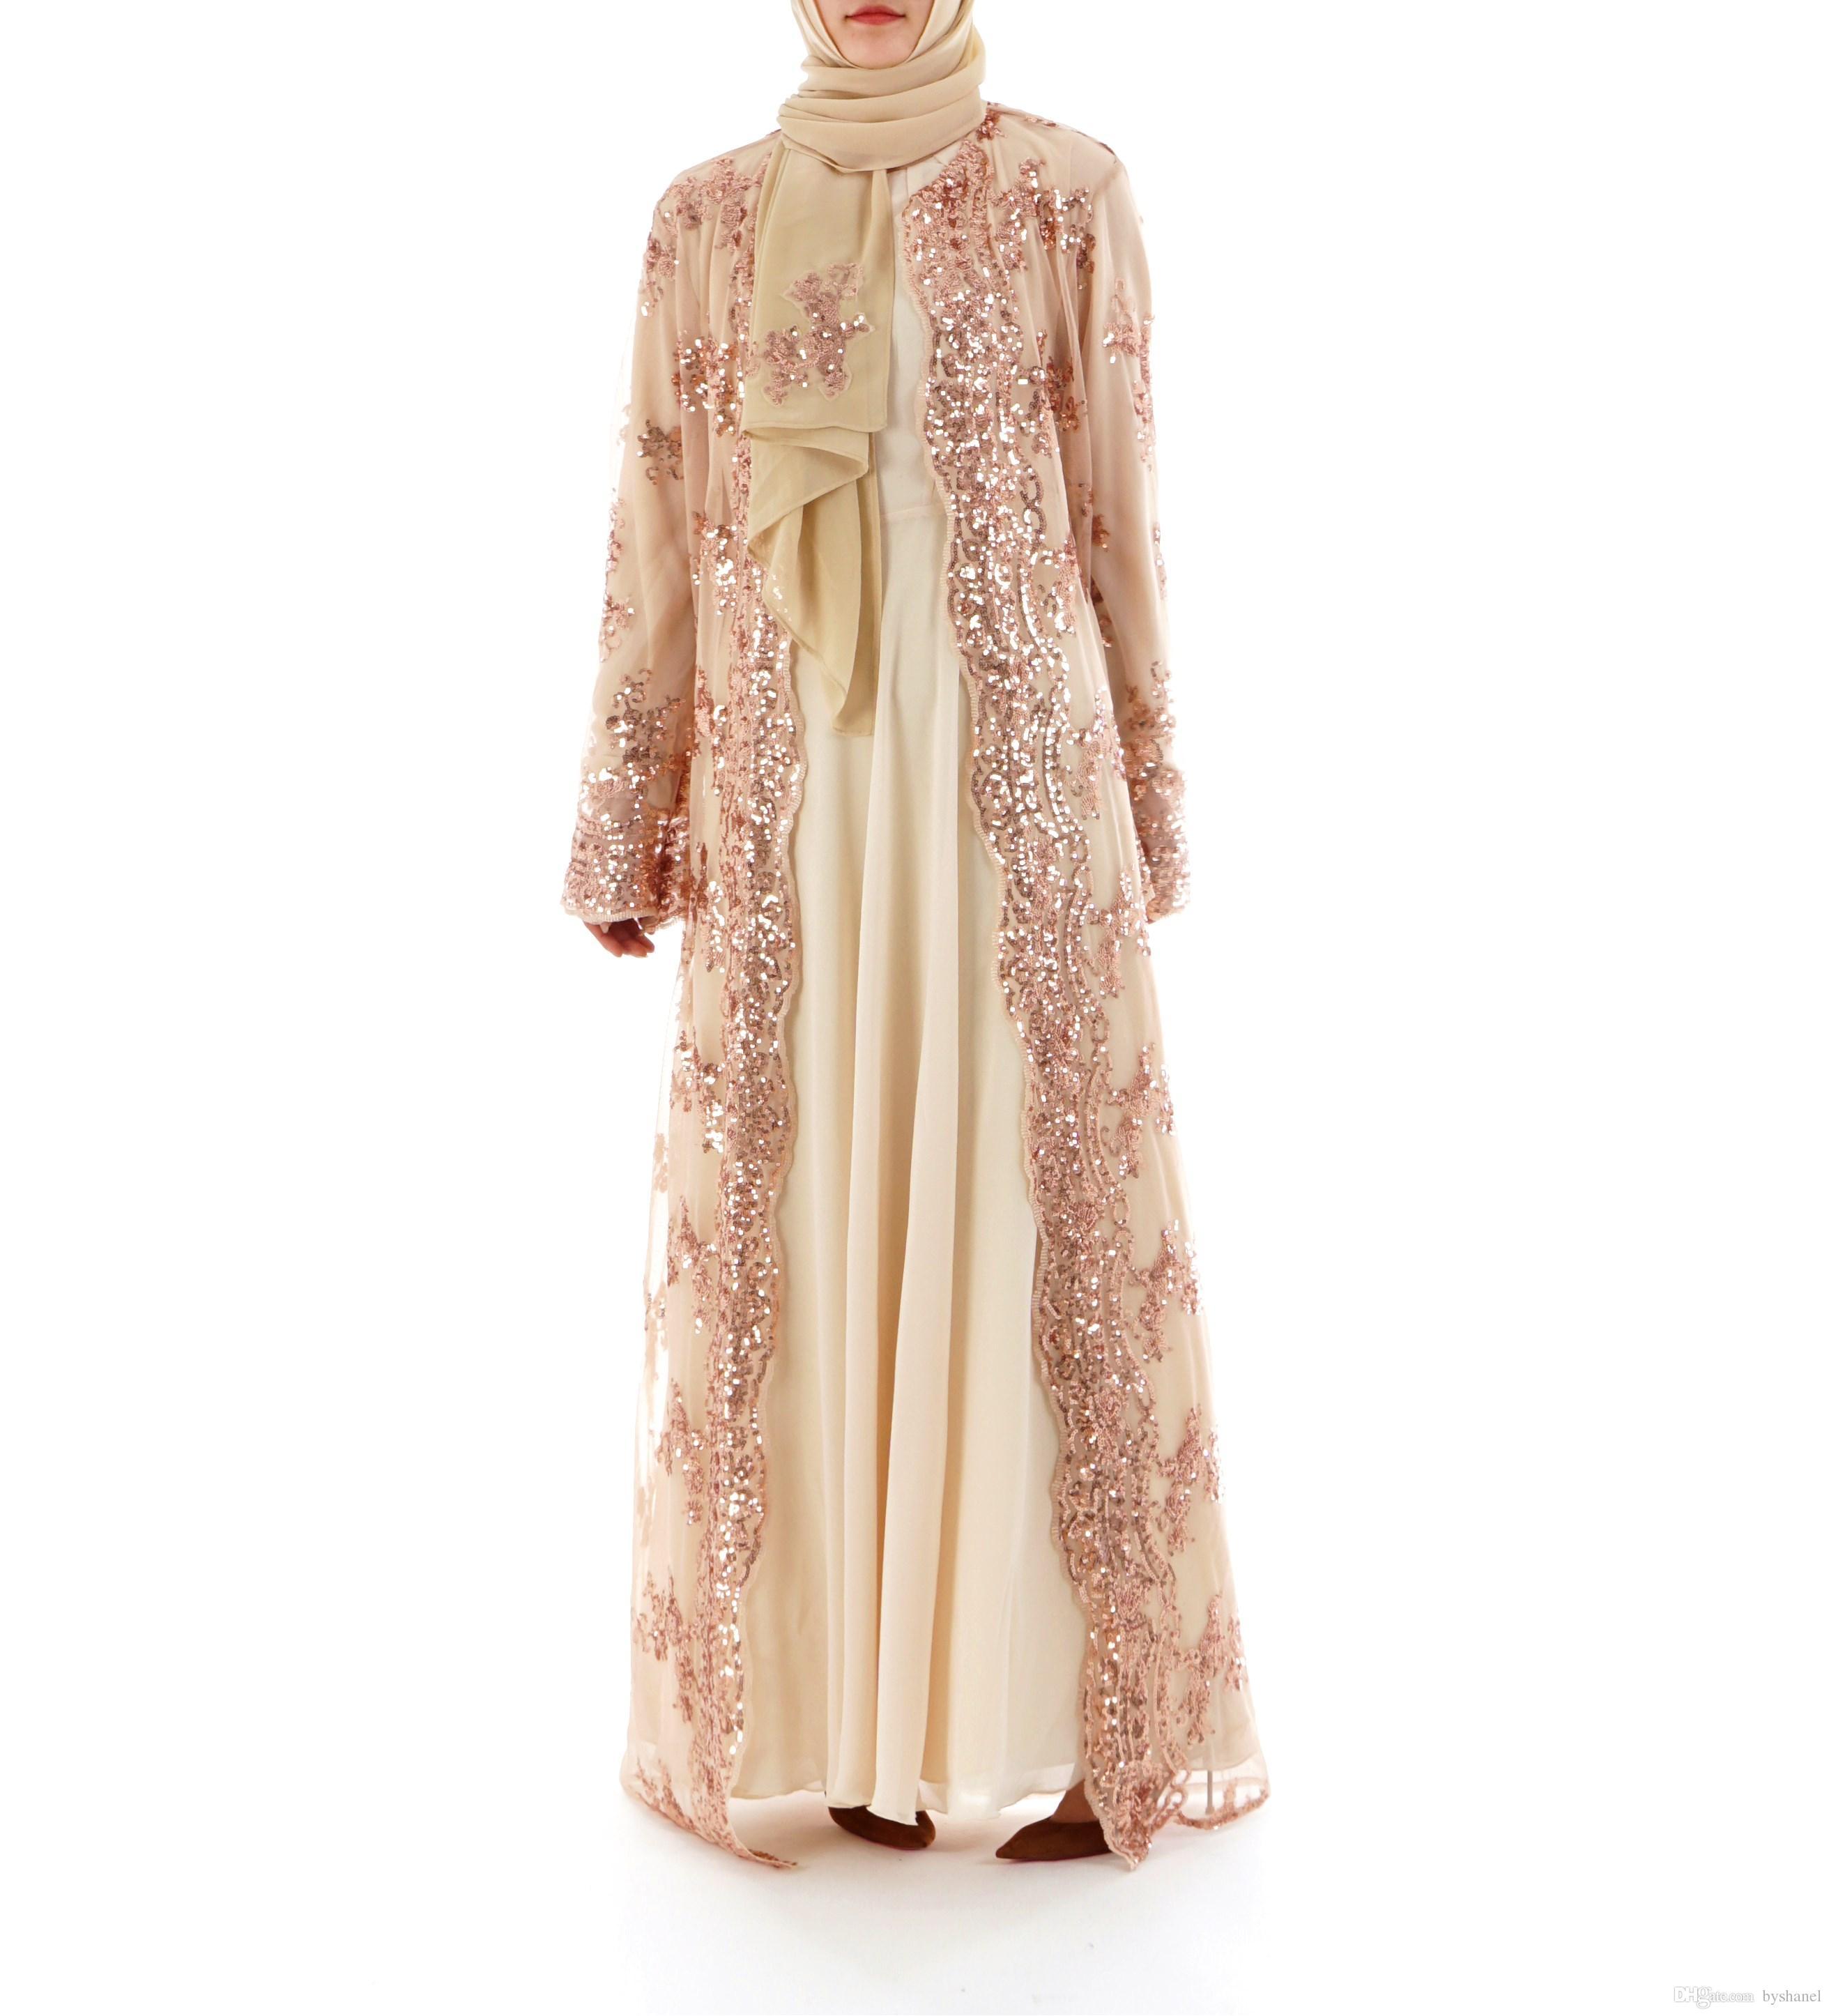 61918aaf5127 2019 Fashion Women Sequin Embroidery Lace Perspective Abaya Muslim Women  Long Cardigan Chiffon Blouse Turkish Islamic Clothing From Byshanel, ...